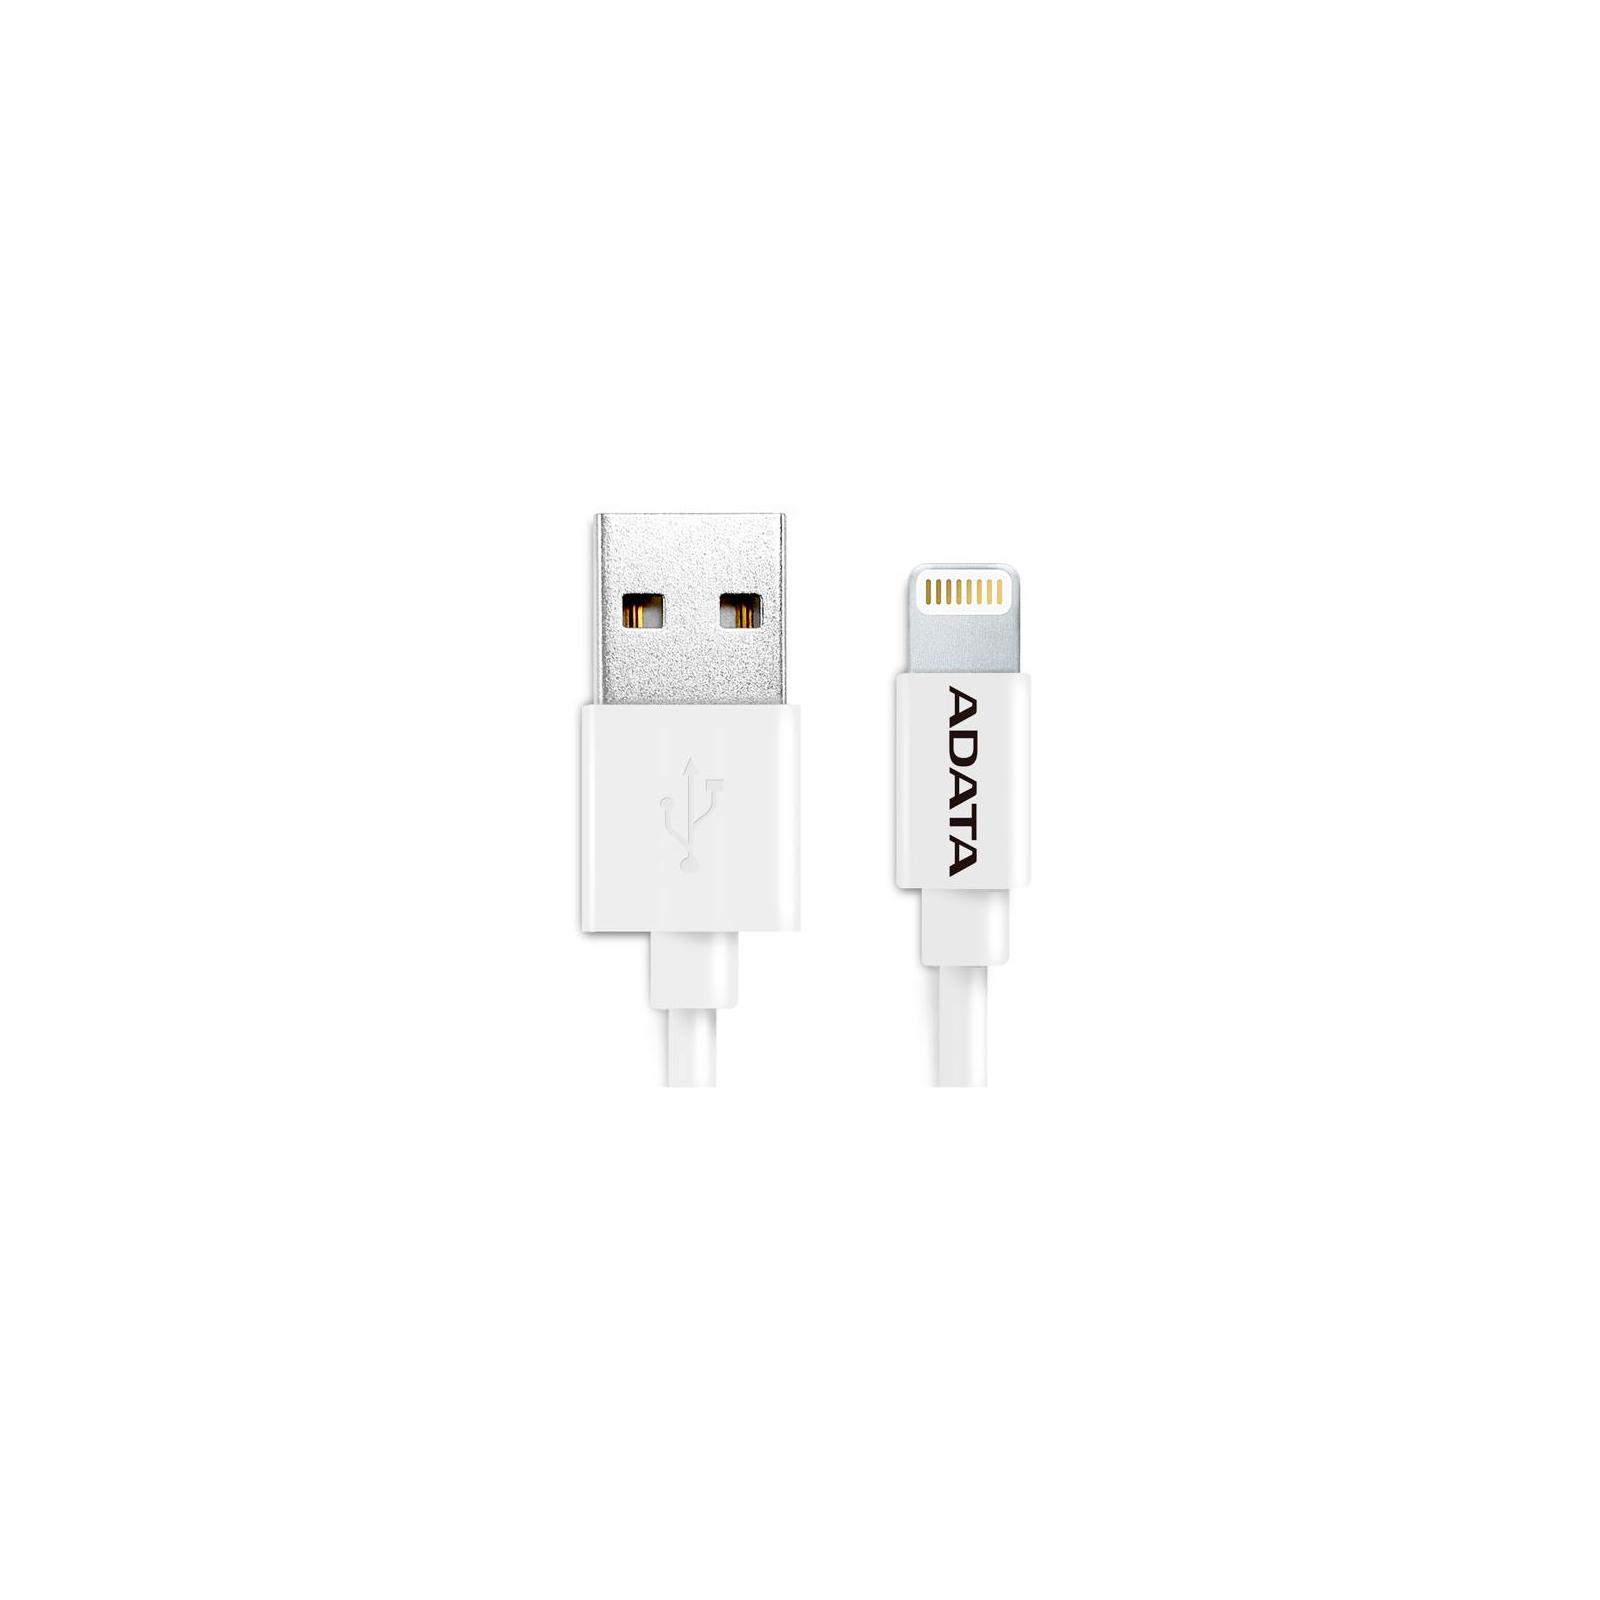 Дата кабель USB 2.0 AM to Lightning 1.0m MFI White ADATA (AMFIPL-100CM-CWH) изображение 2